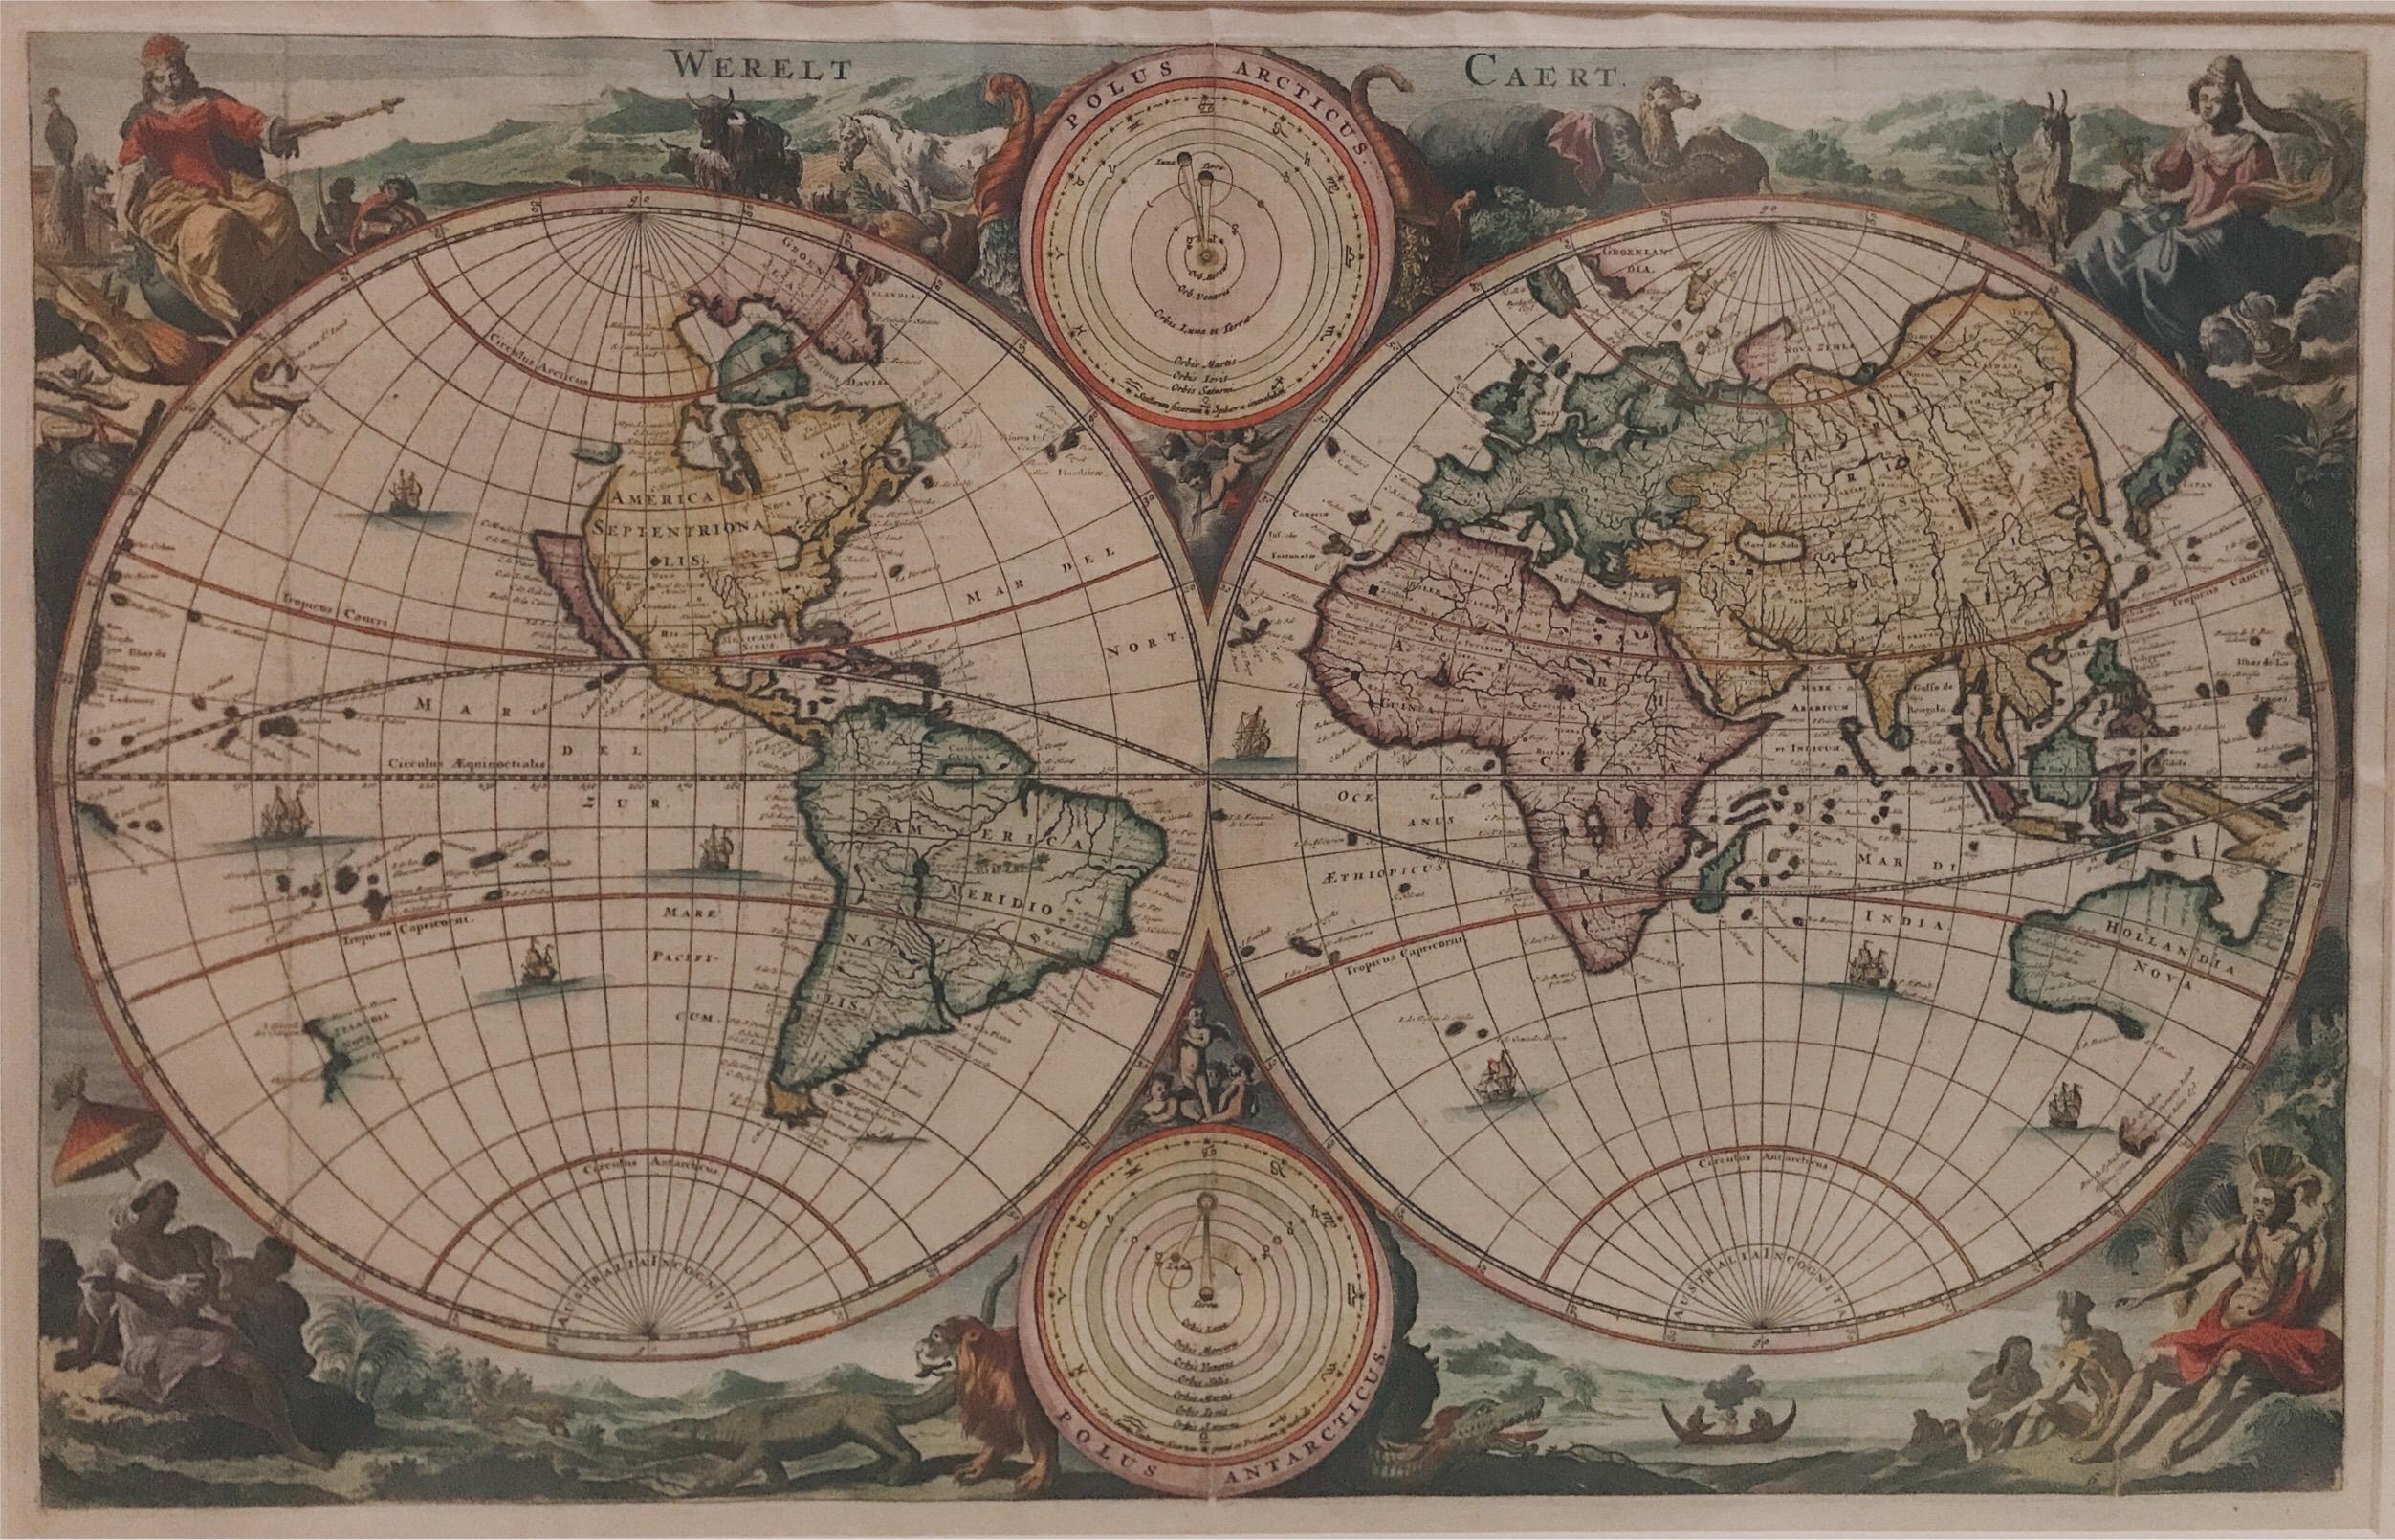 Double hemisphere world map - Stoopendaal (c.1730)